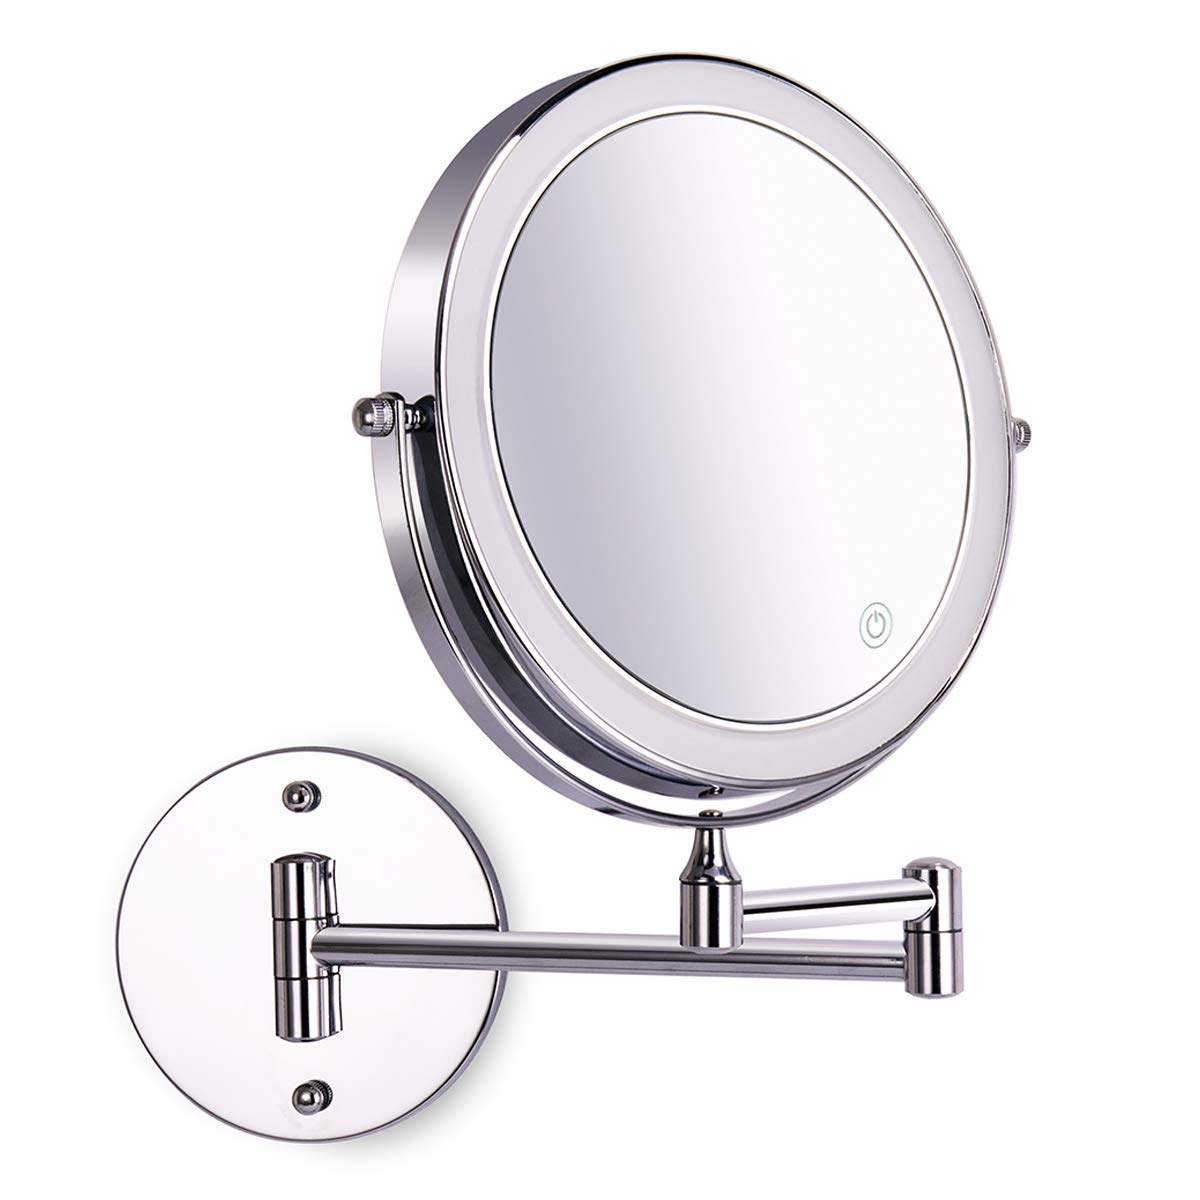 Amelar 8 Inch Wall Mounted Makeup Mirror